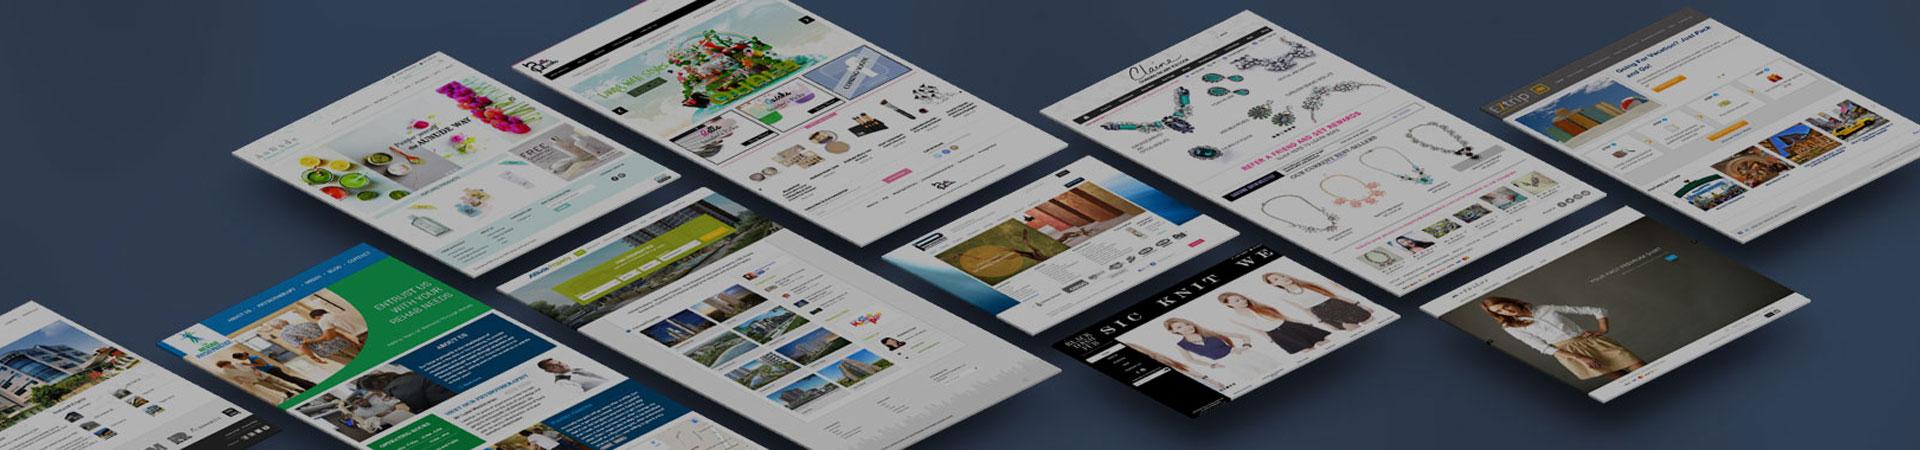 Website Design Singapore - Lalashop